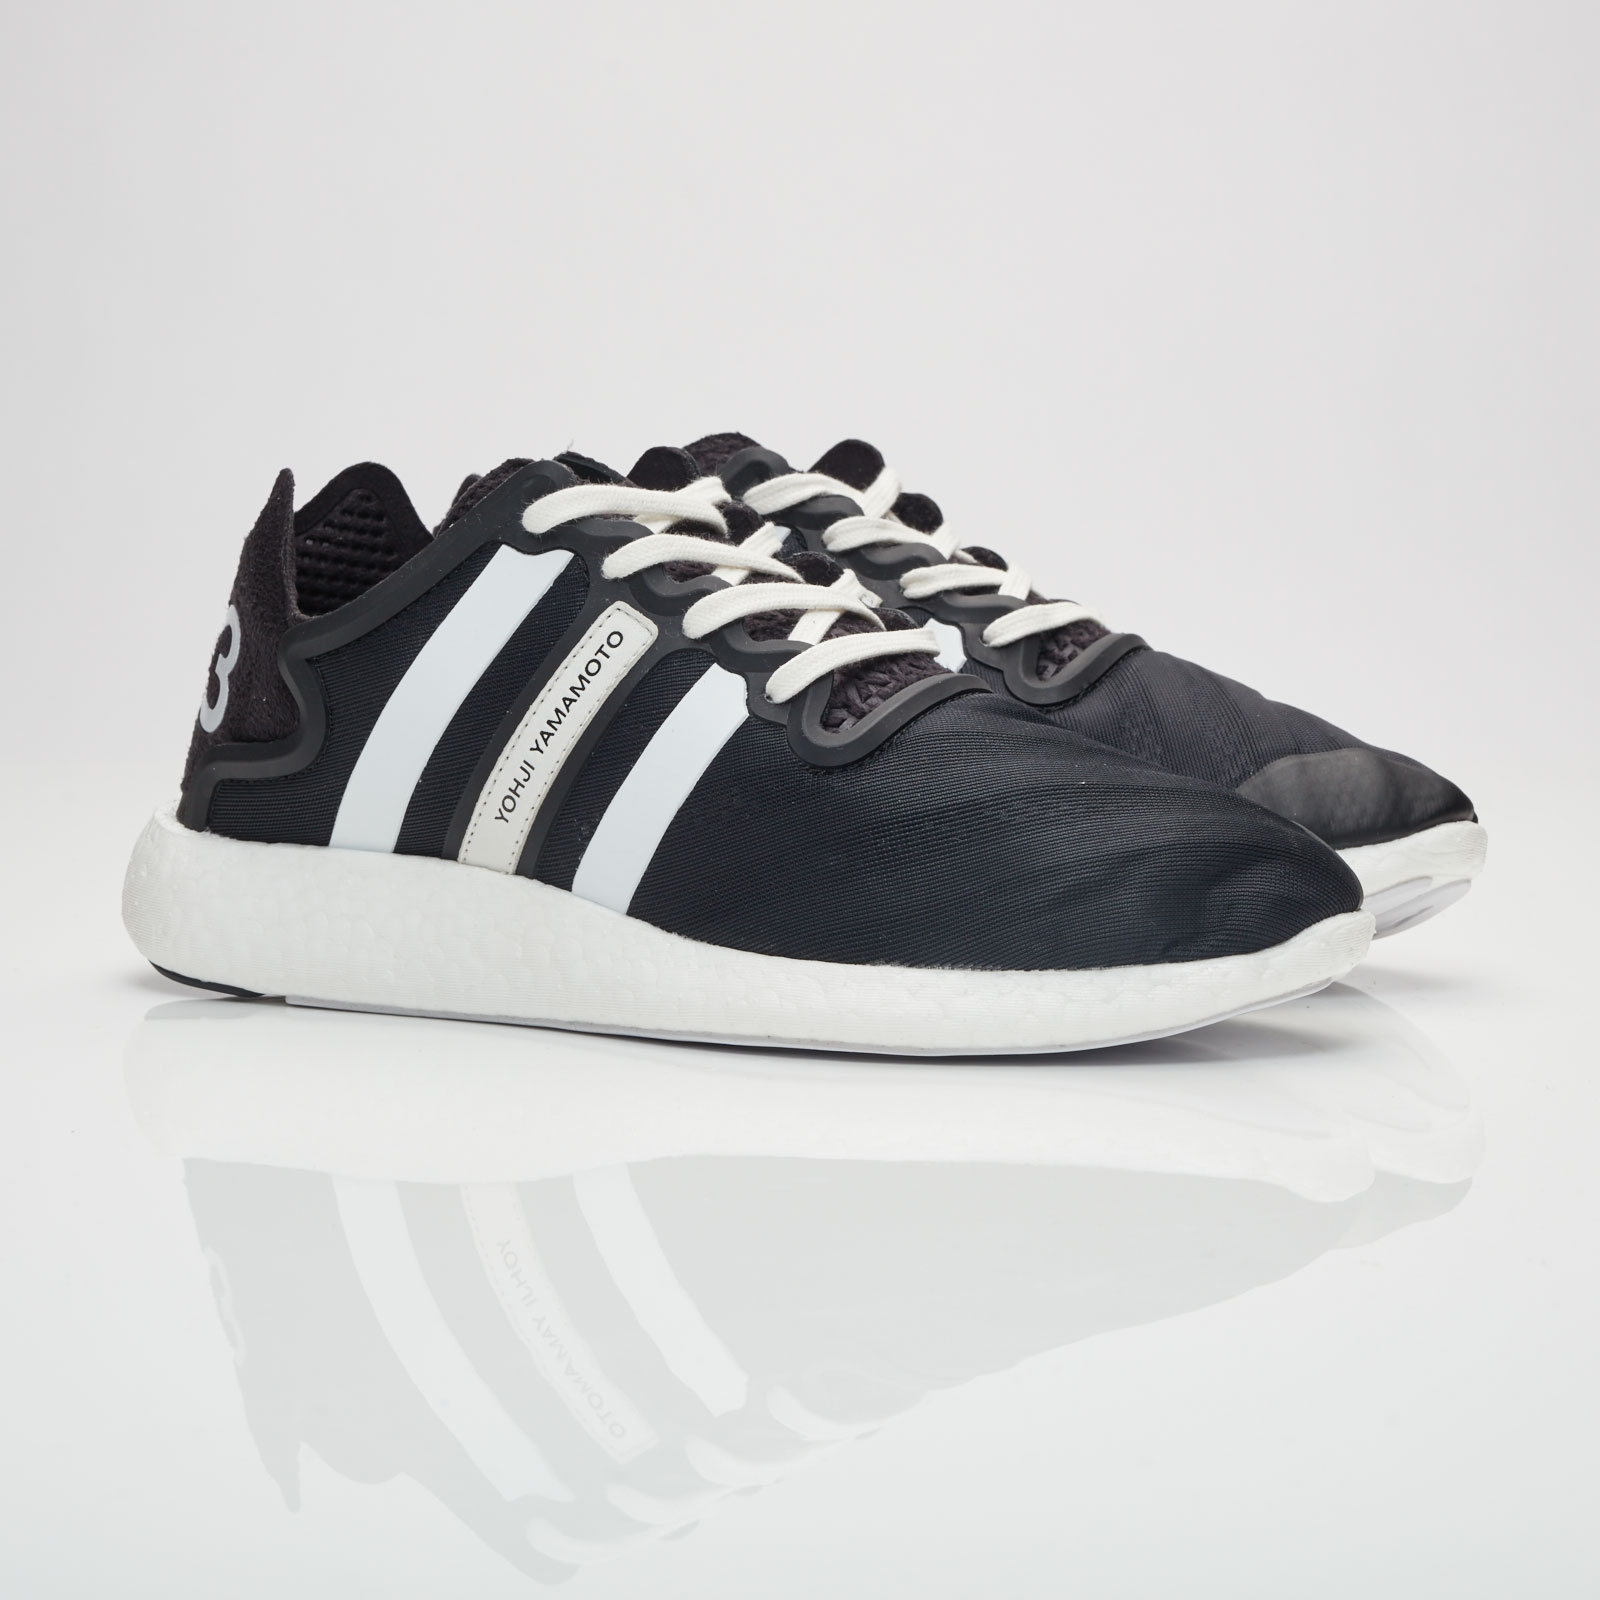 160bfe9e6 adidas Yohji Run - S82118 - Sneakersnstuff